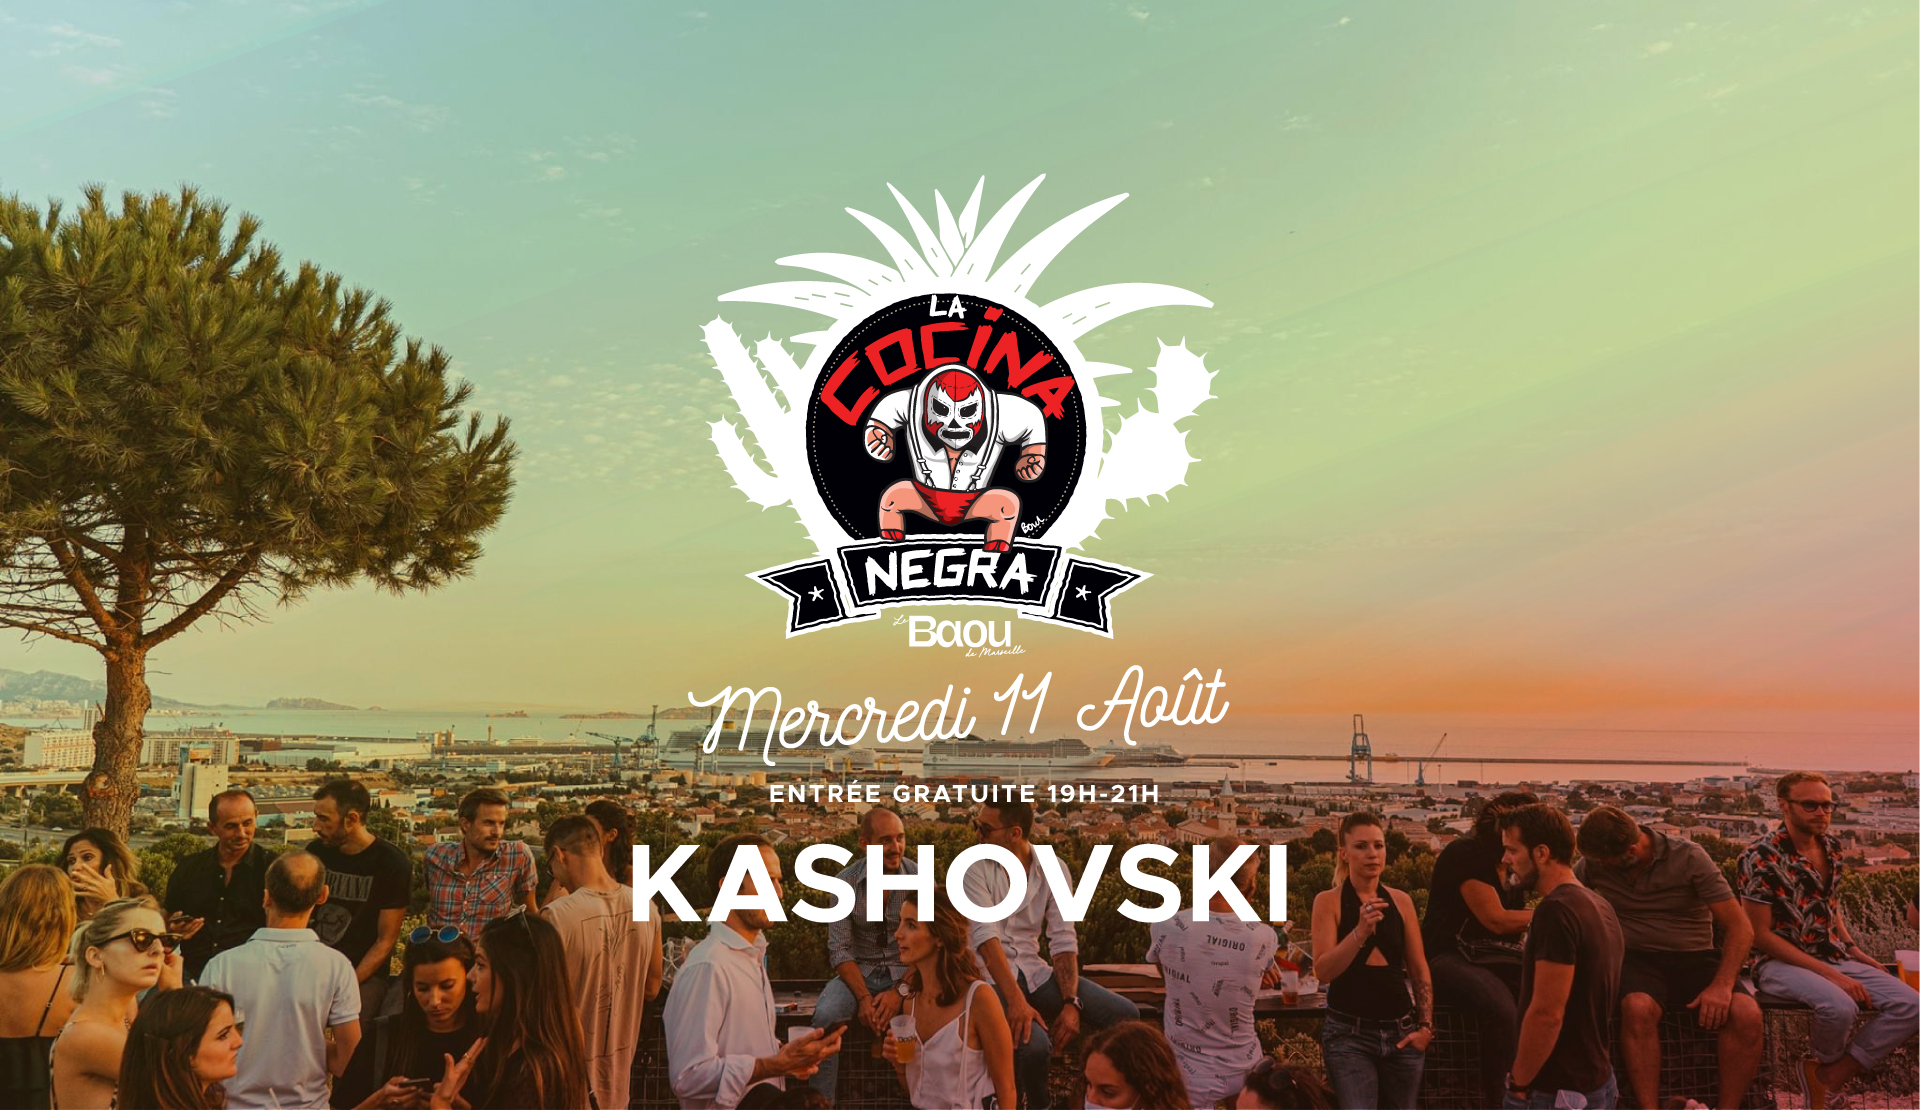 La Cocina Negra : KASHOVSKI